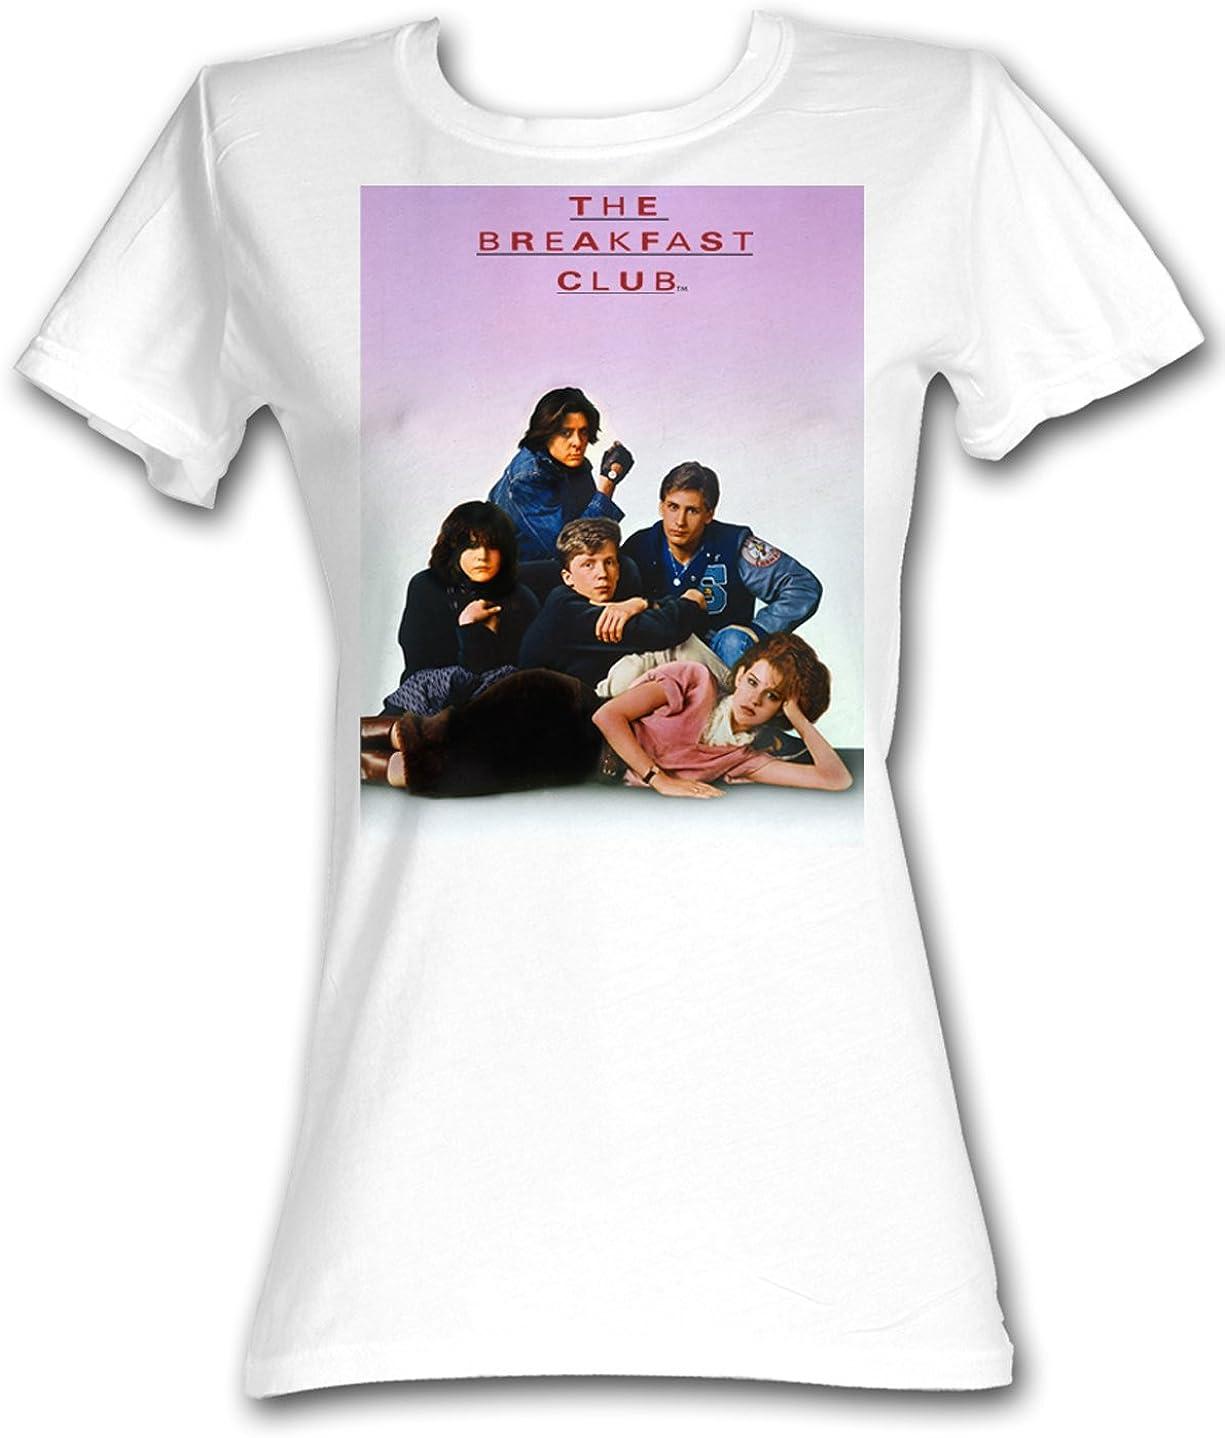 Credence The Breakfast Club T-Shirt Juniors Tucson Mall